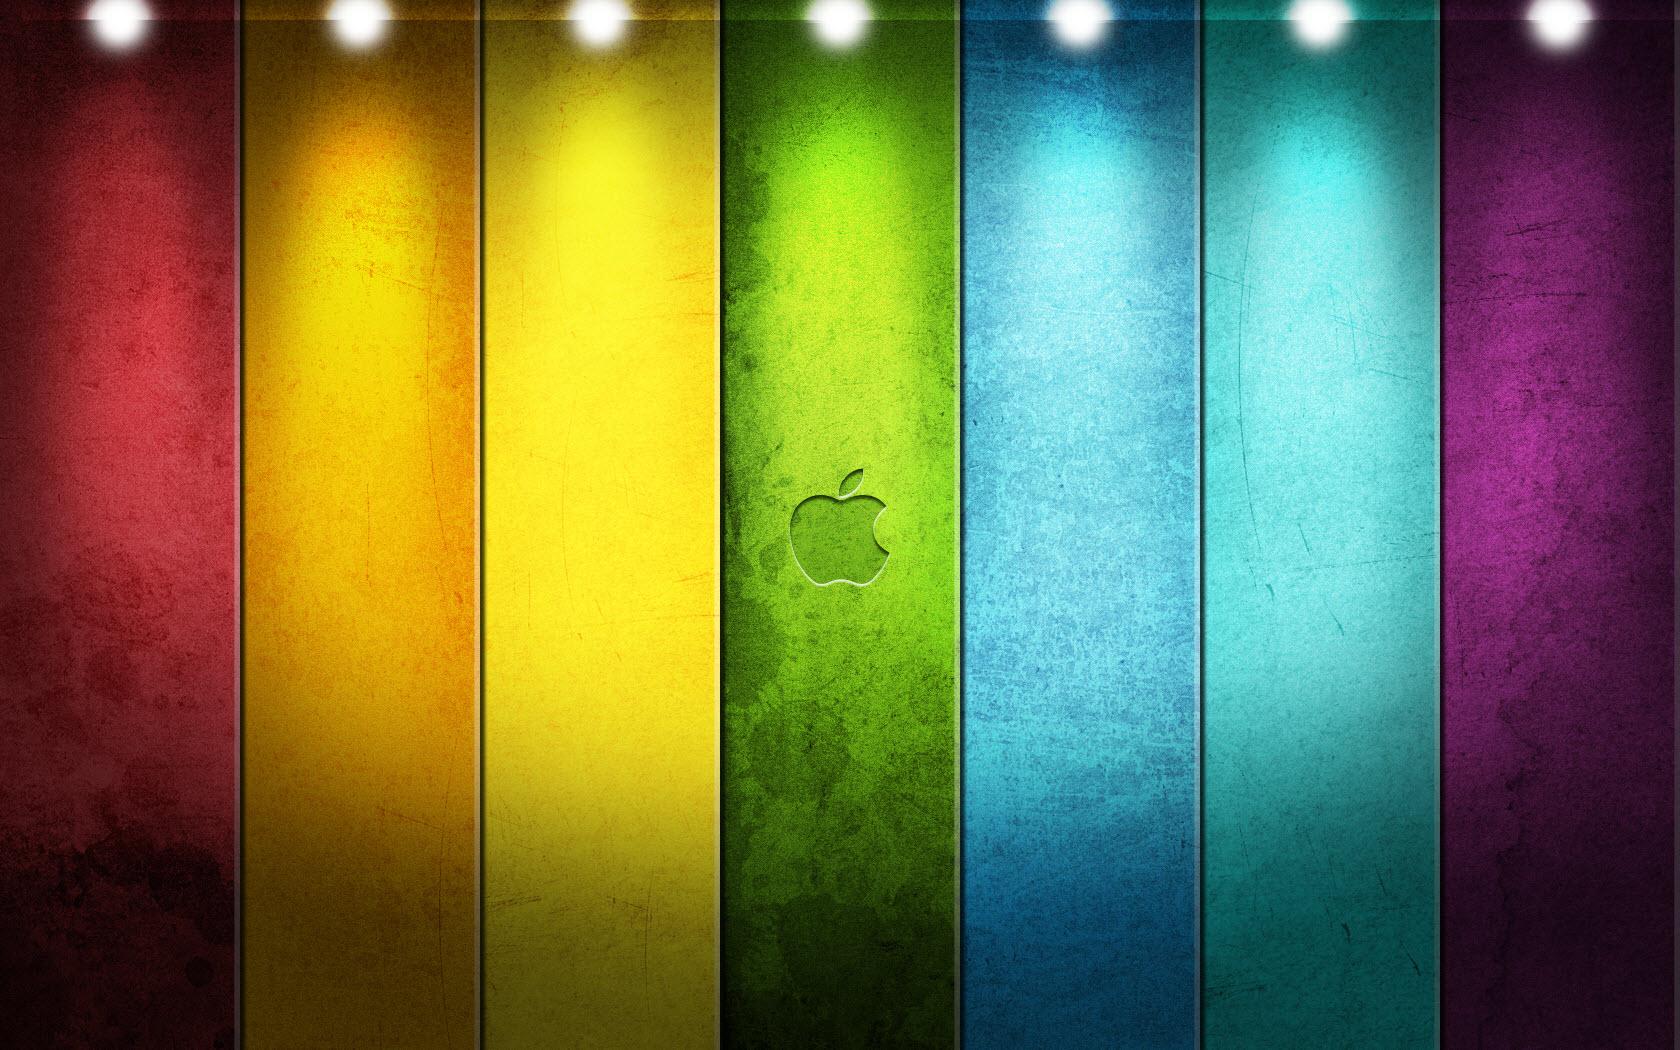 wallpaper apple focus colors apple, asus, colors, focus